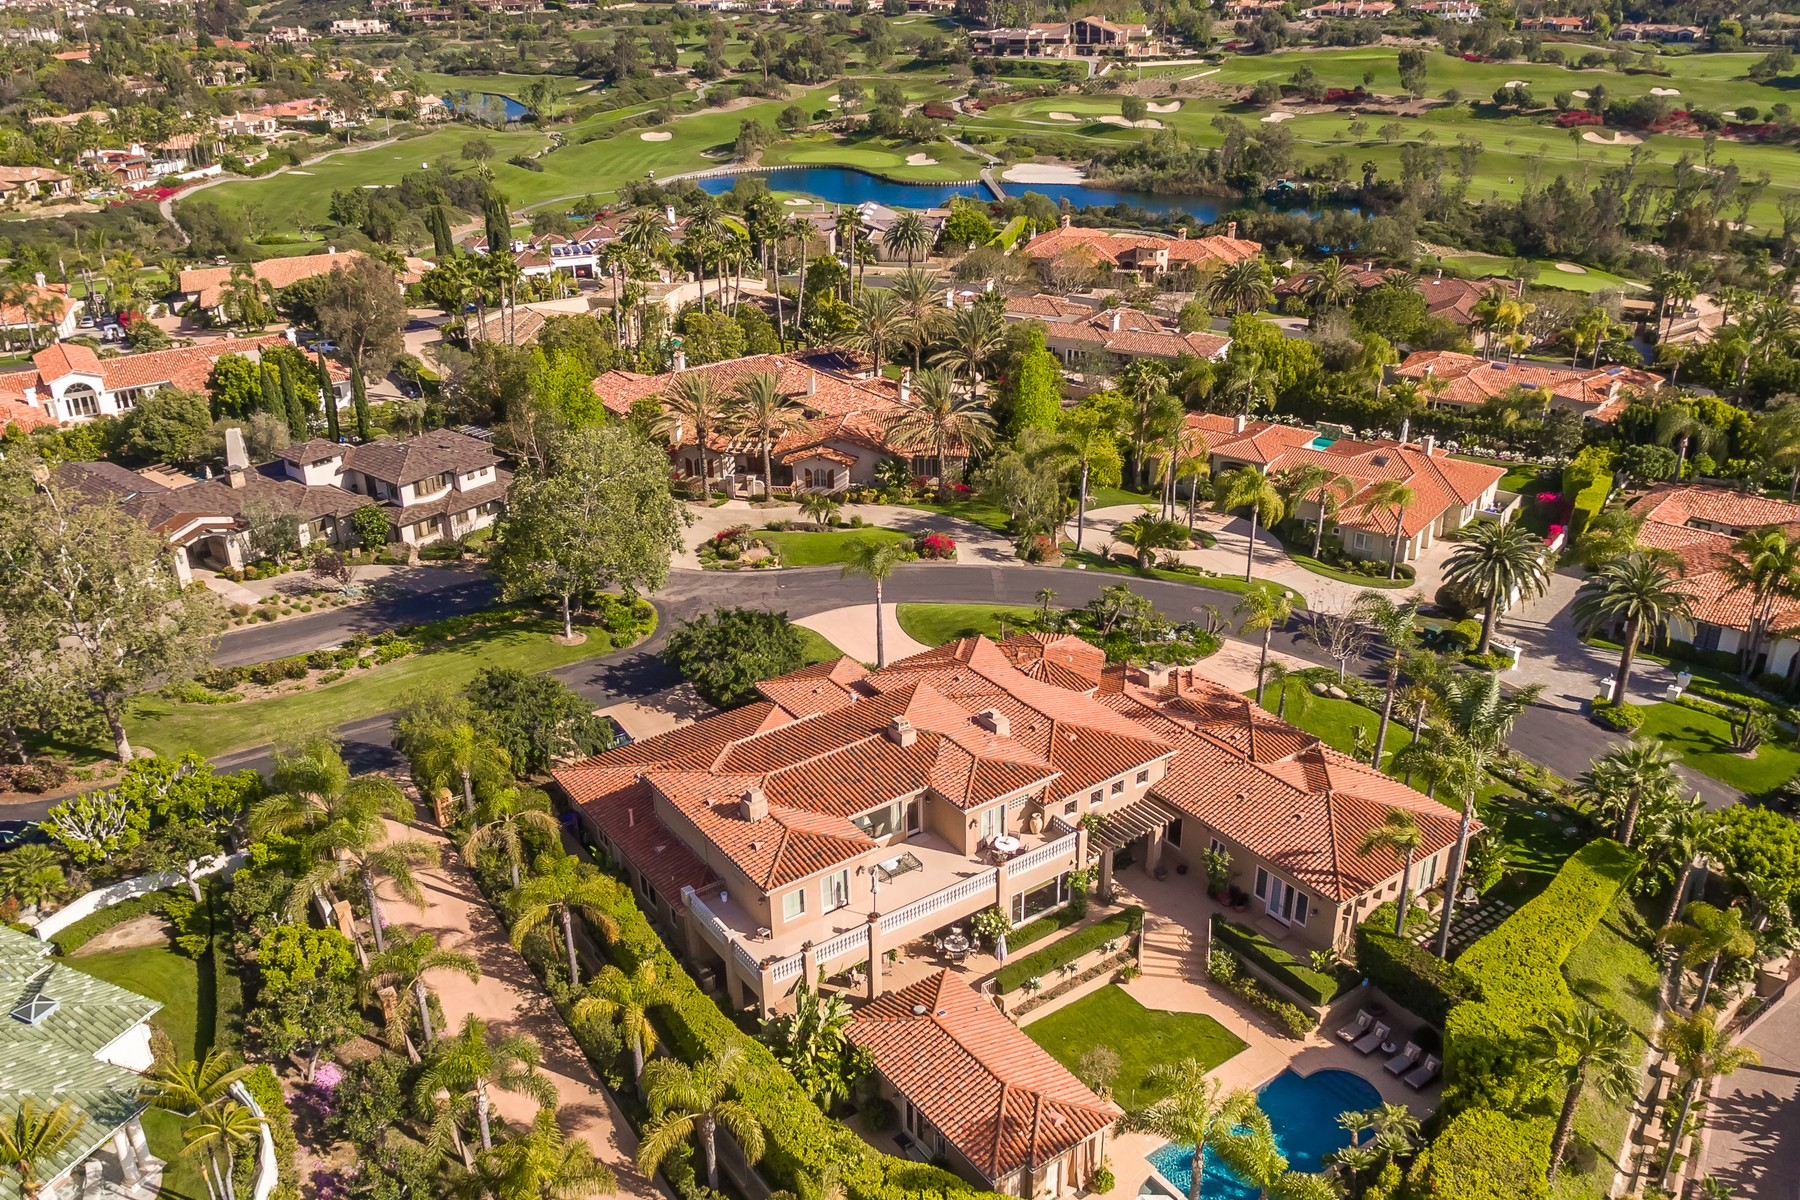 Single Family Home for Sale at 7846 Muirfield Way Rancho Santa Fe, California, 92067 United States